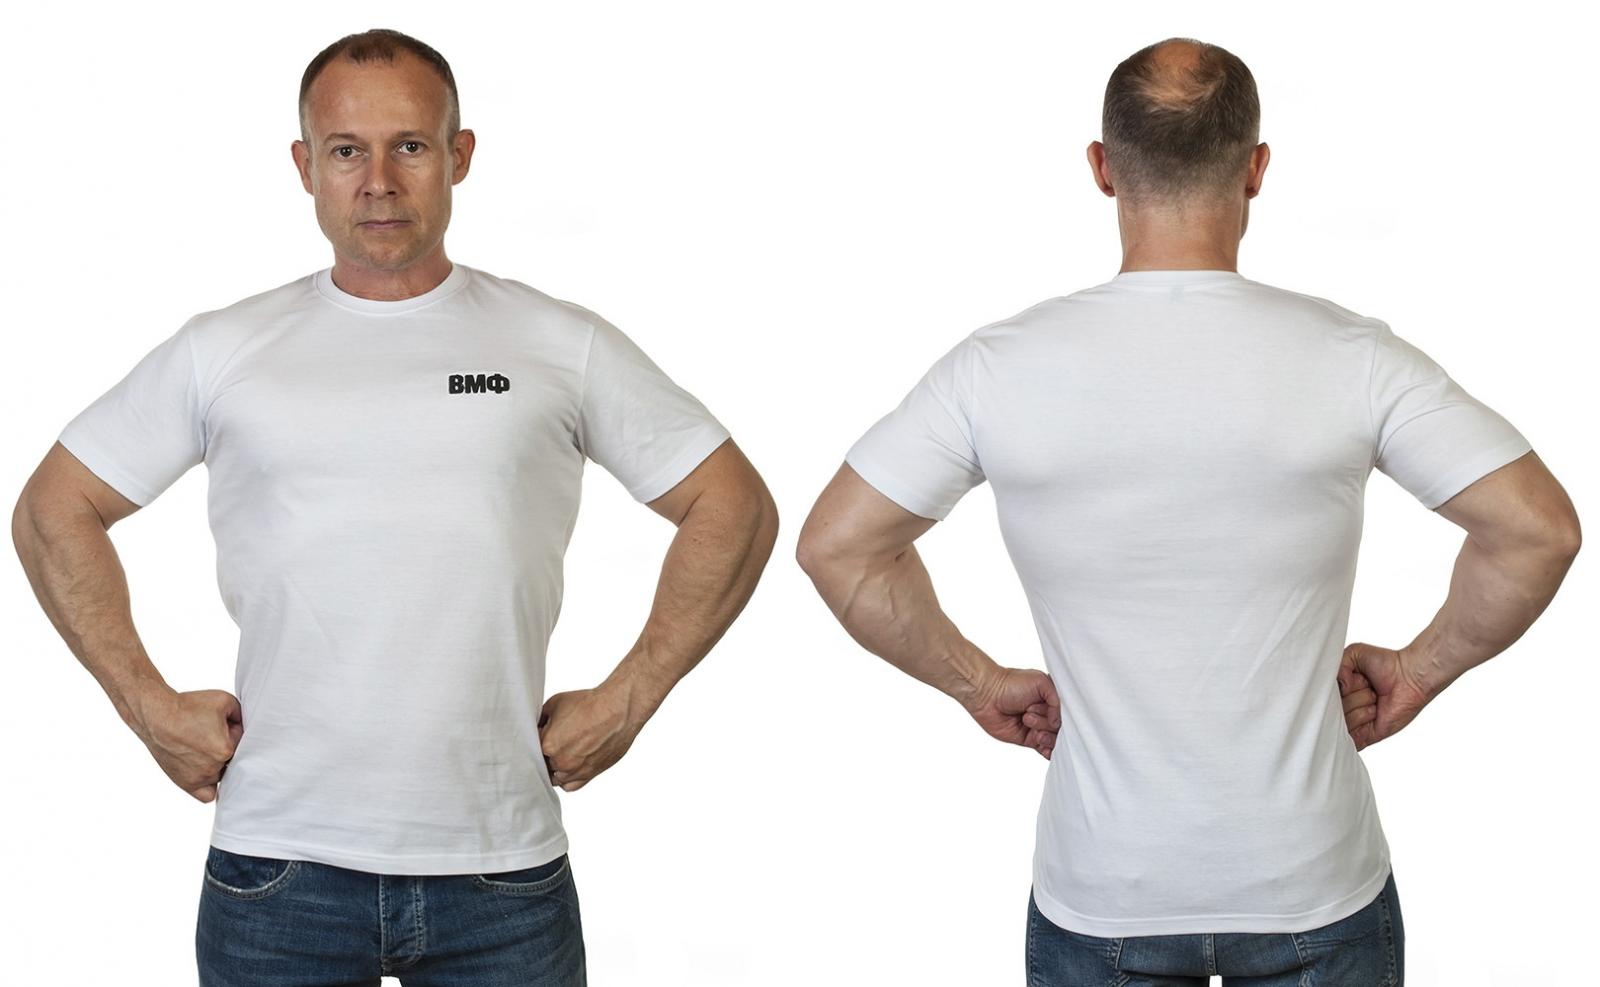 Белая футболка ВМФ с вышивкой на груди с доставкой